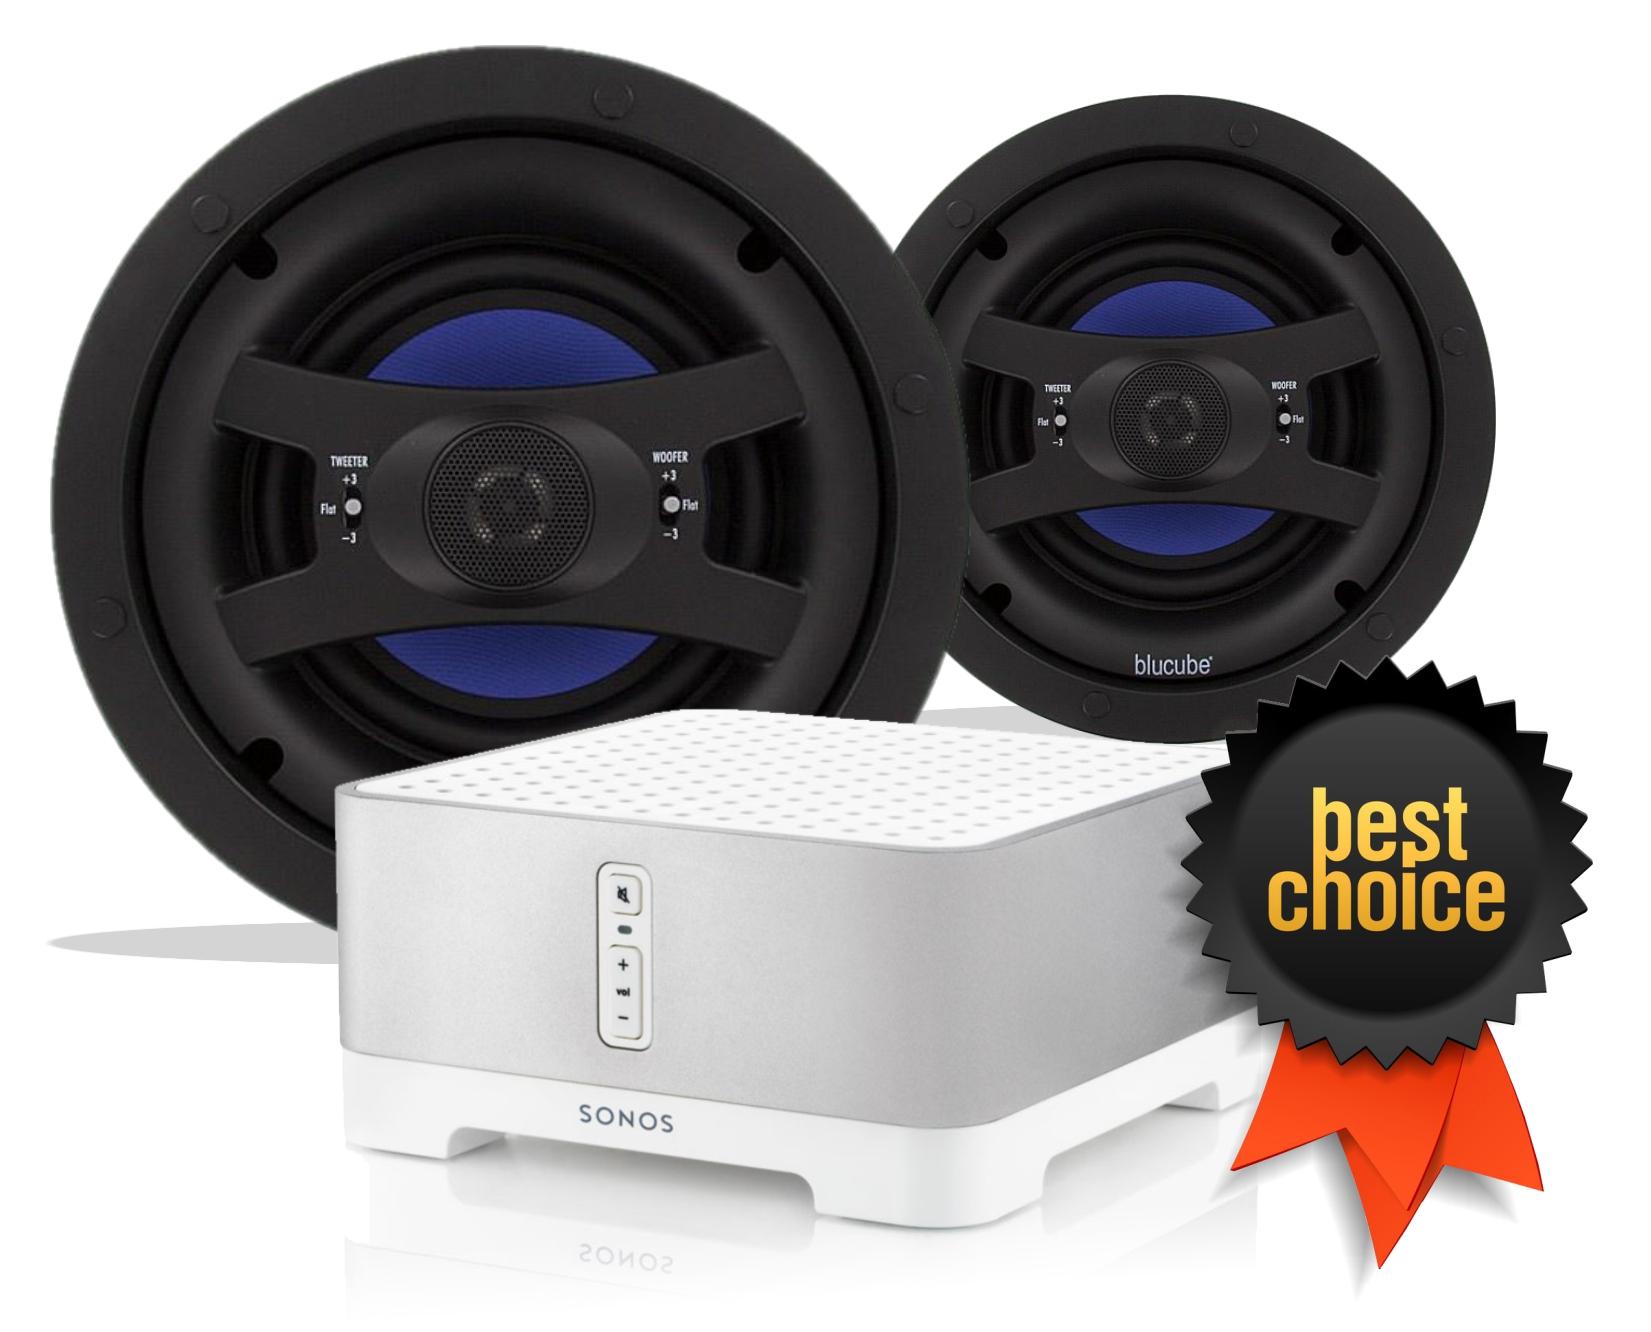 sonos connect amp blucube cxcl 800 ceiling speaker bundle. Black Bedroom Furniture Sets. Home Design Ideas